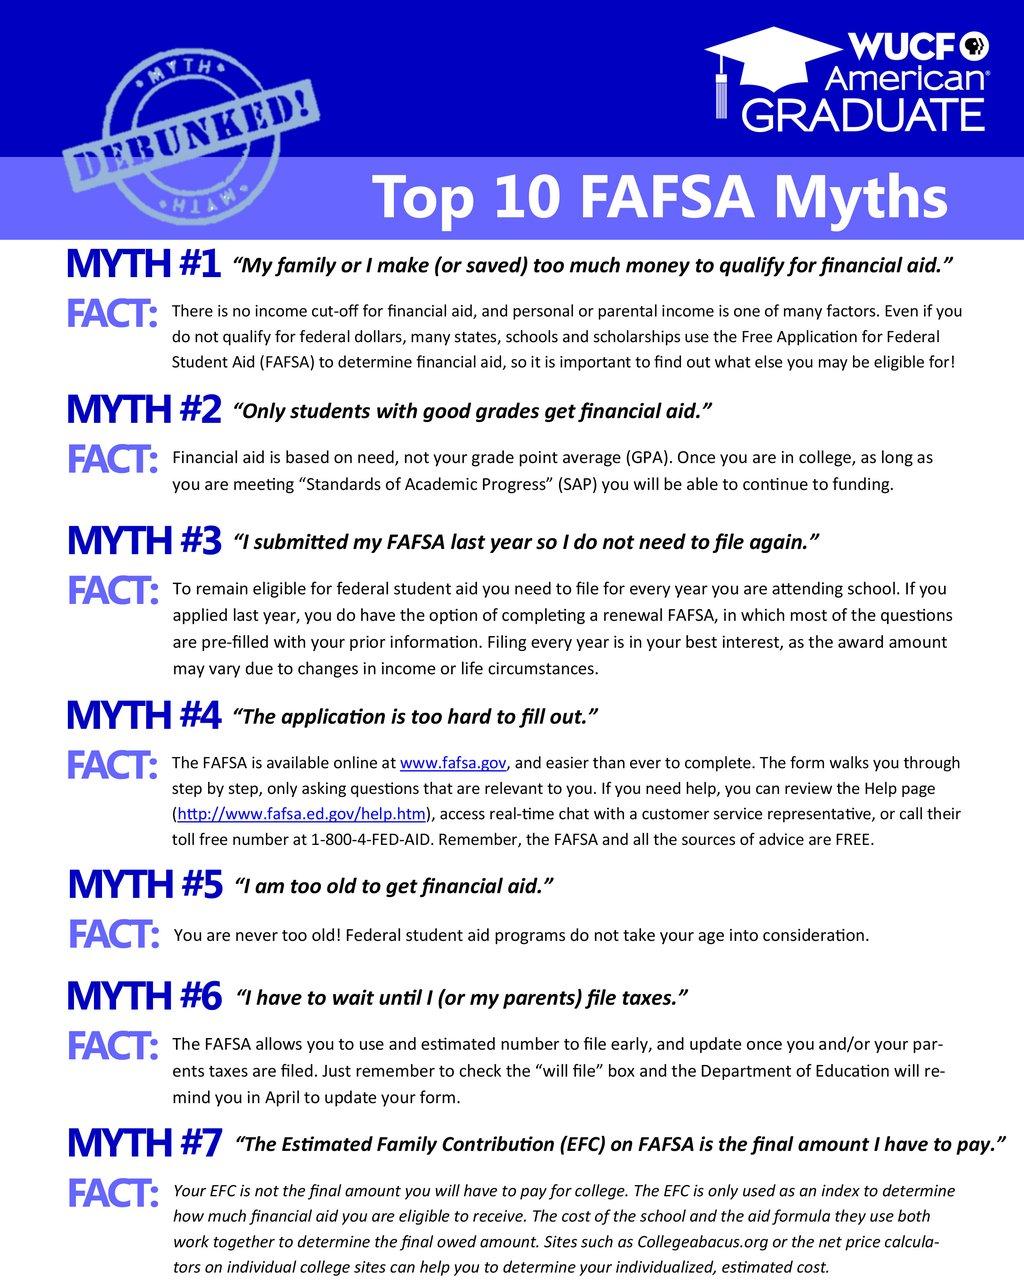 FAFSA-Myths-WUCF-PG1.jpg